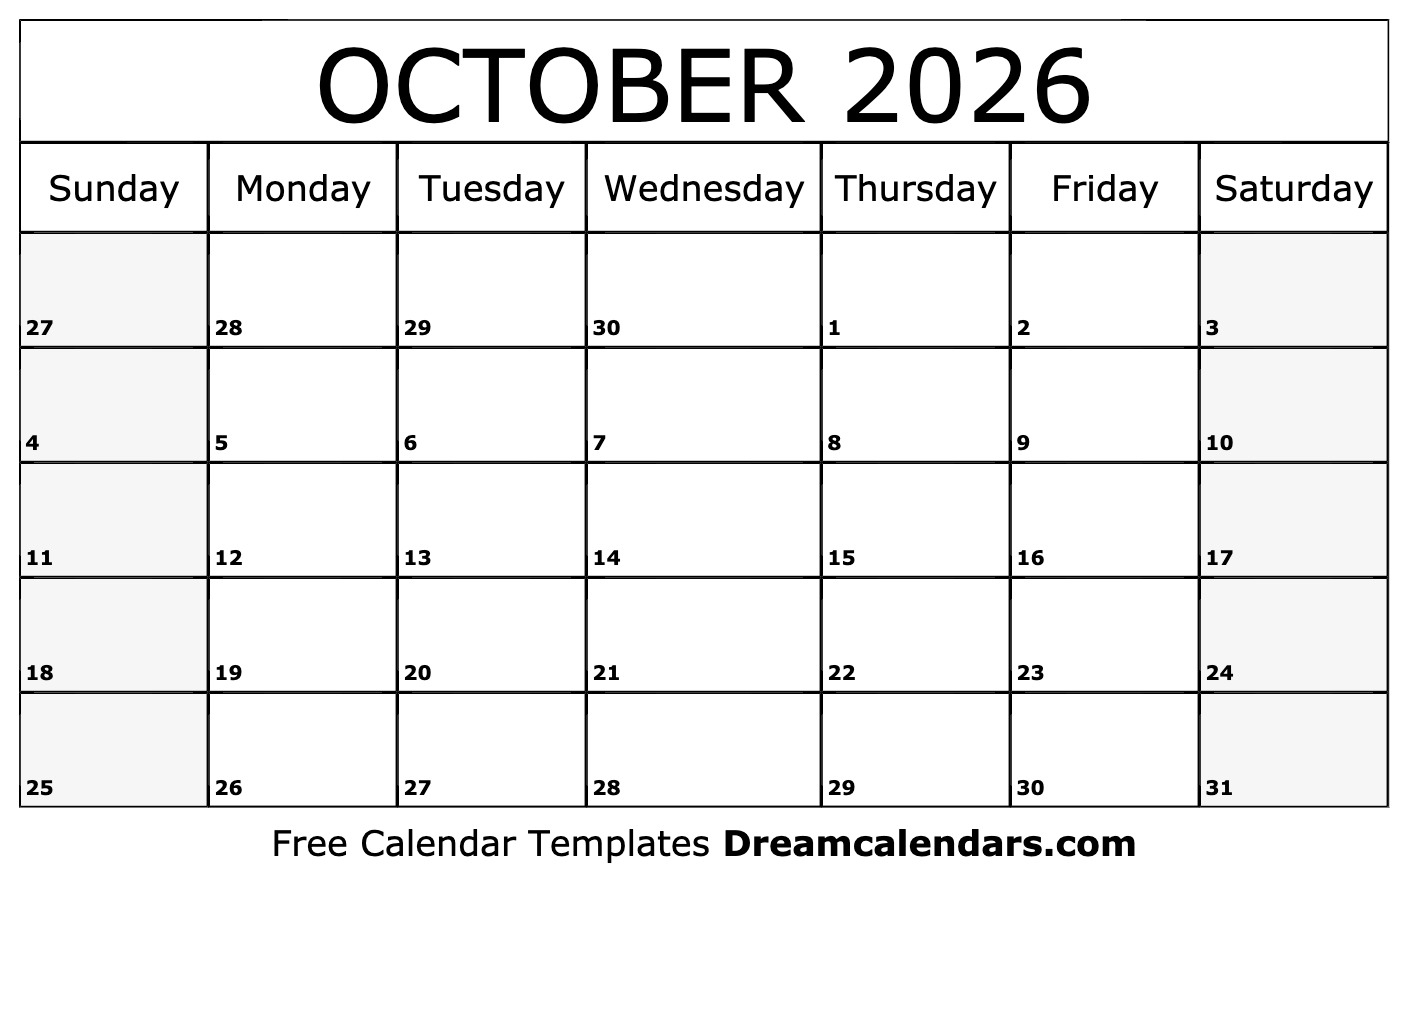 October 2026 Calendar Free Blank Printable Templates